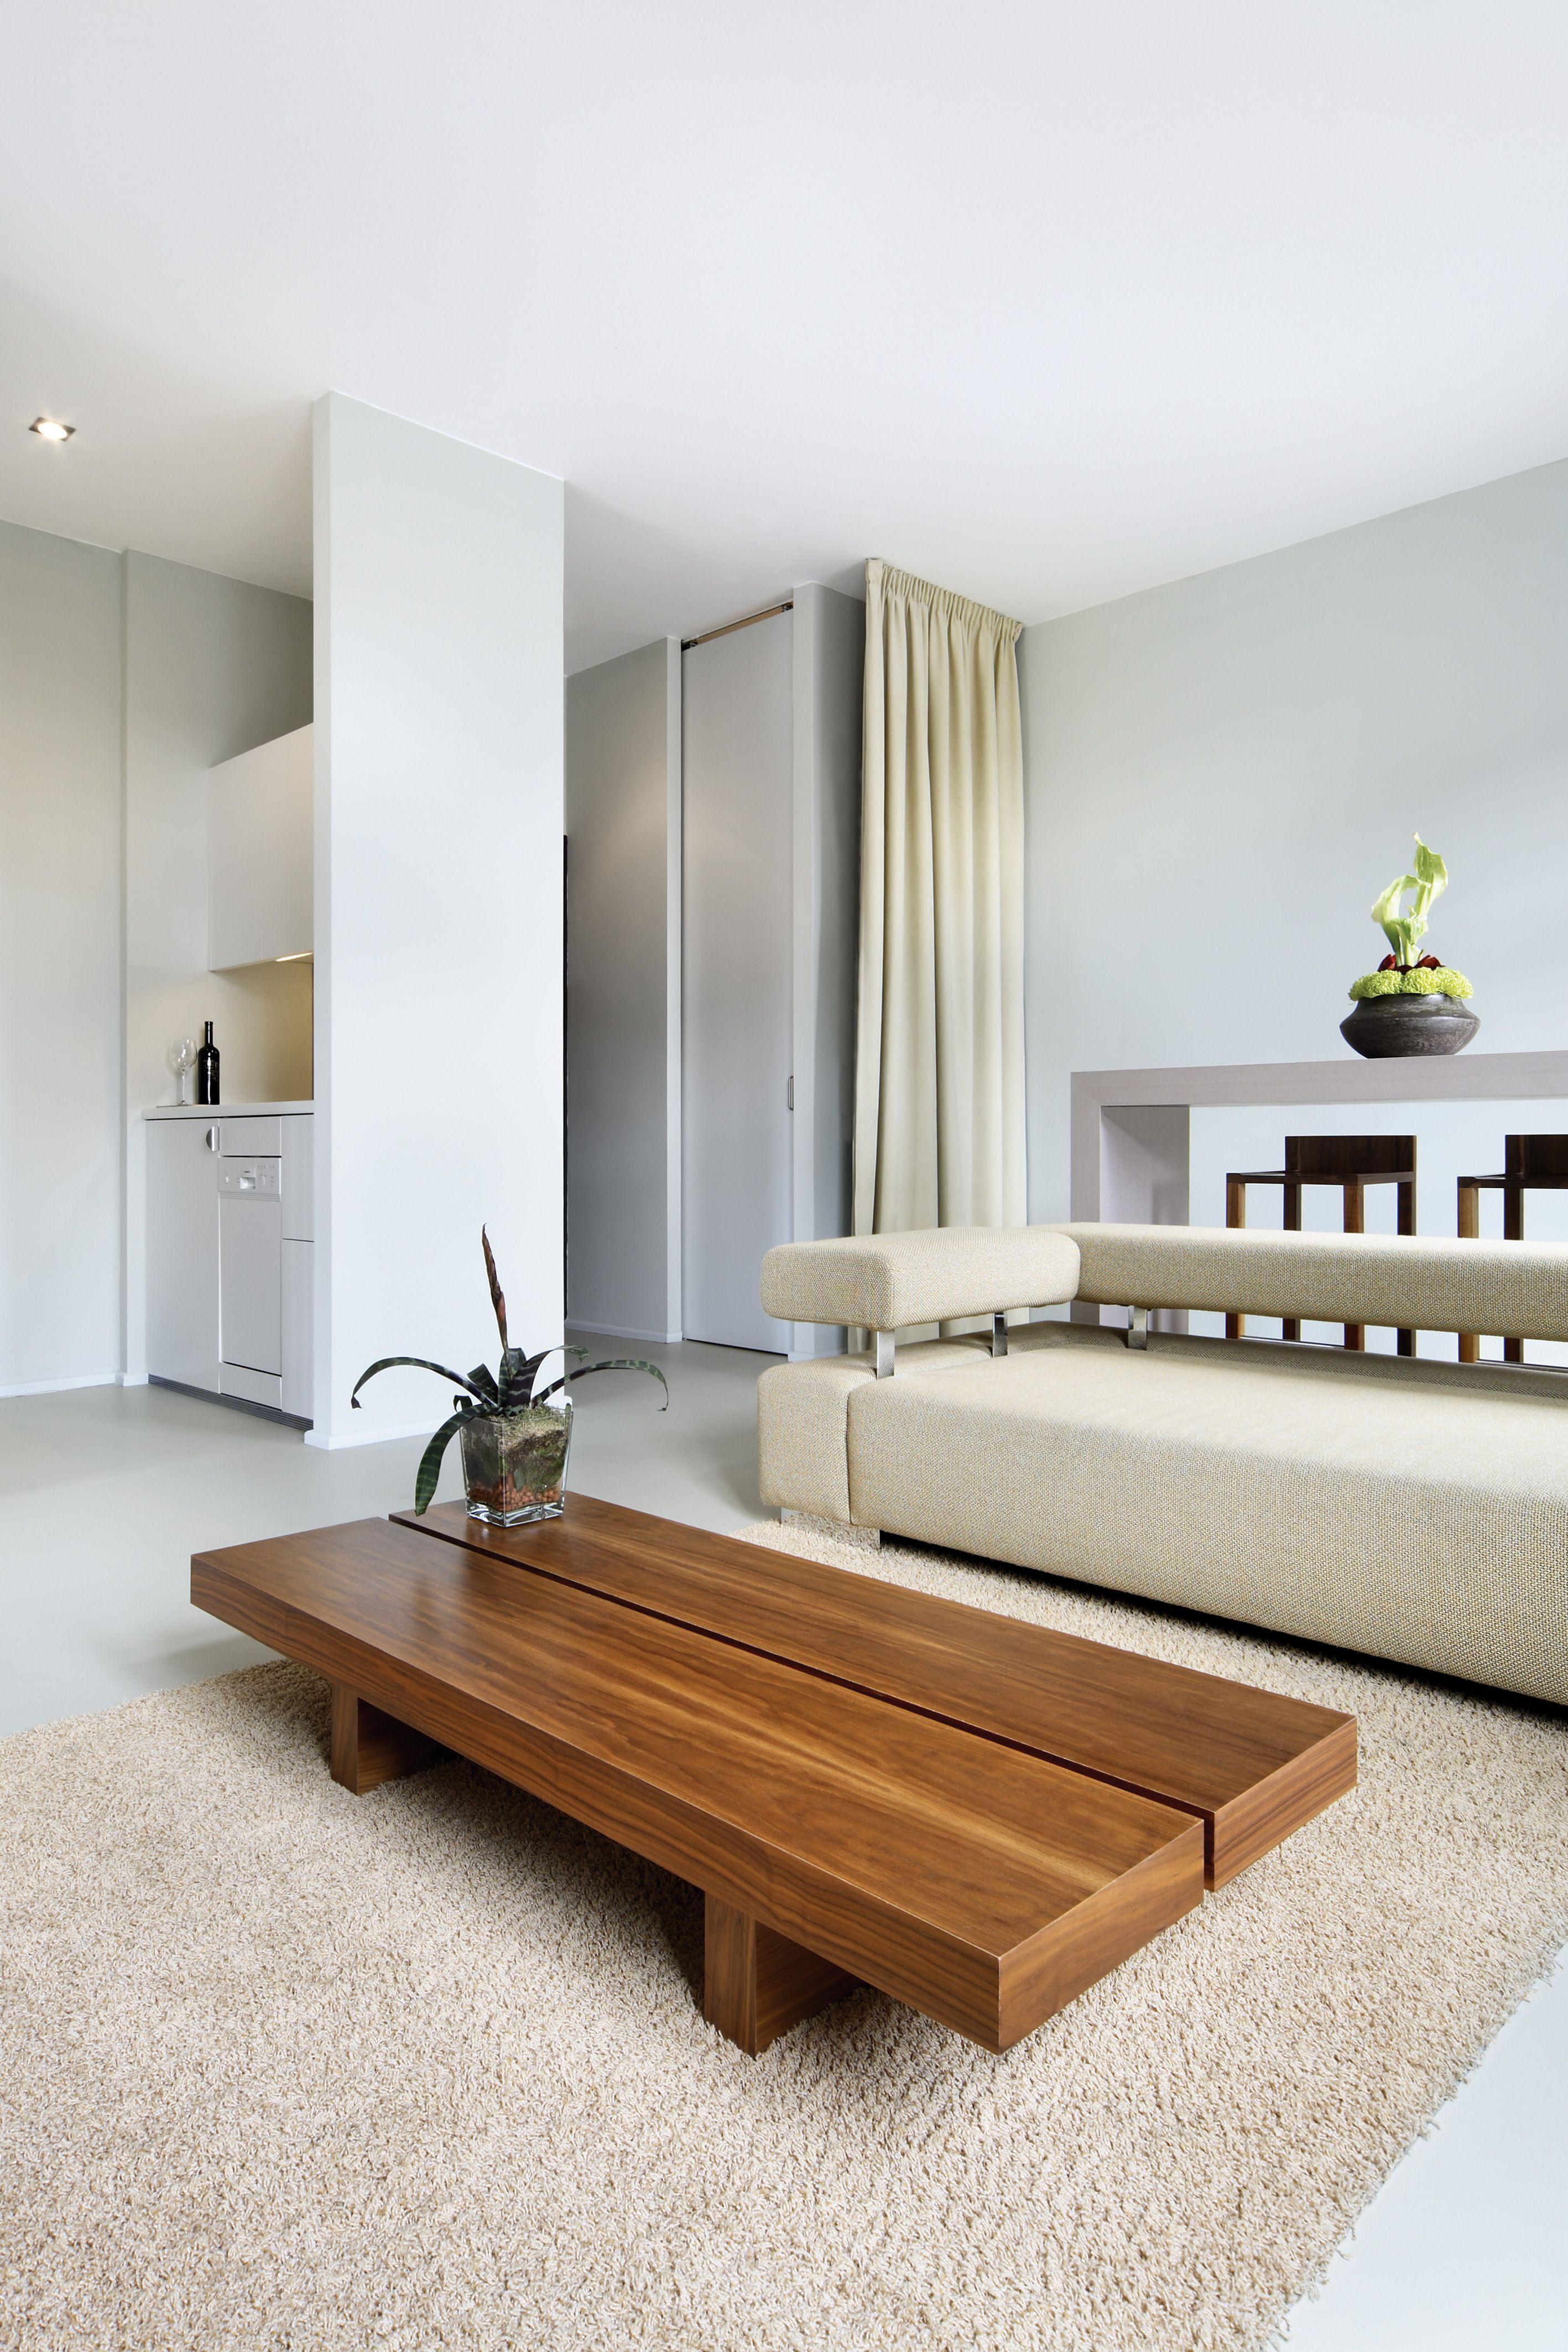 Minimalist Hotel Room: Minimalist Interior Design HOTEL: Lux 11, Berlin. DESIGN:1